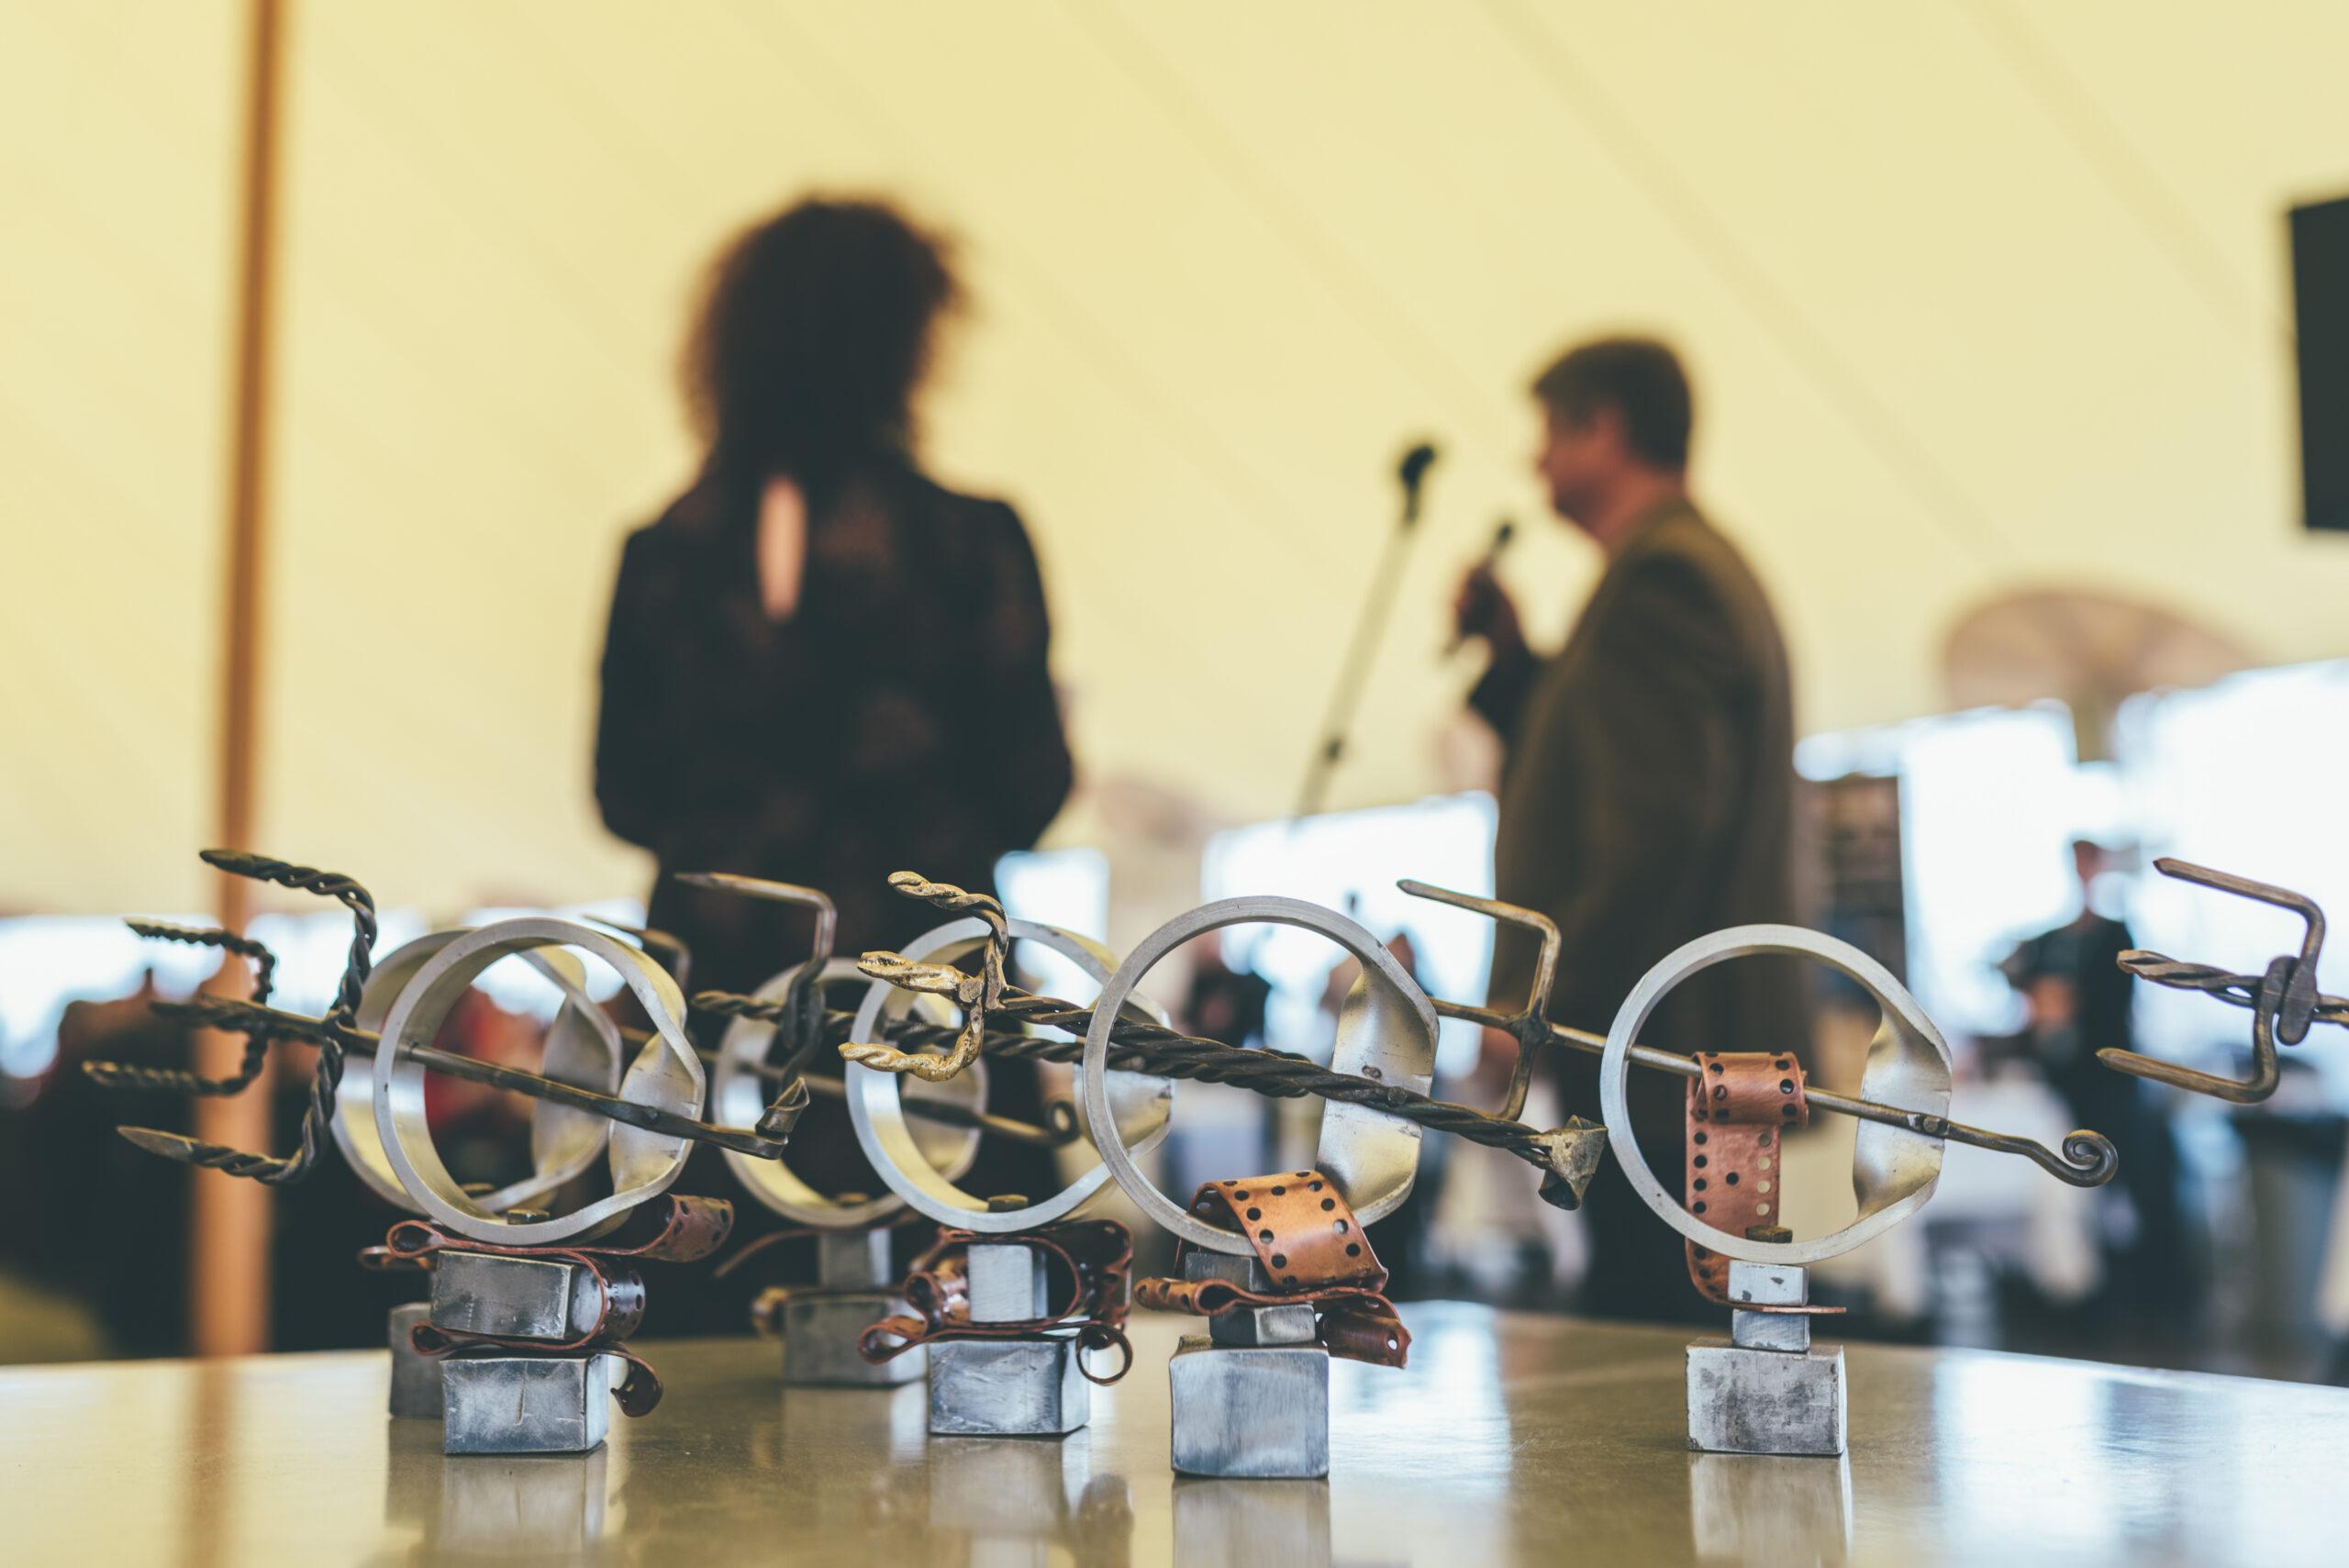 Devour! Golden Tine Awards Ceremony & Reception - IN PERSON